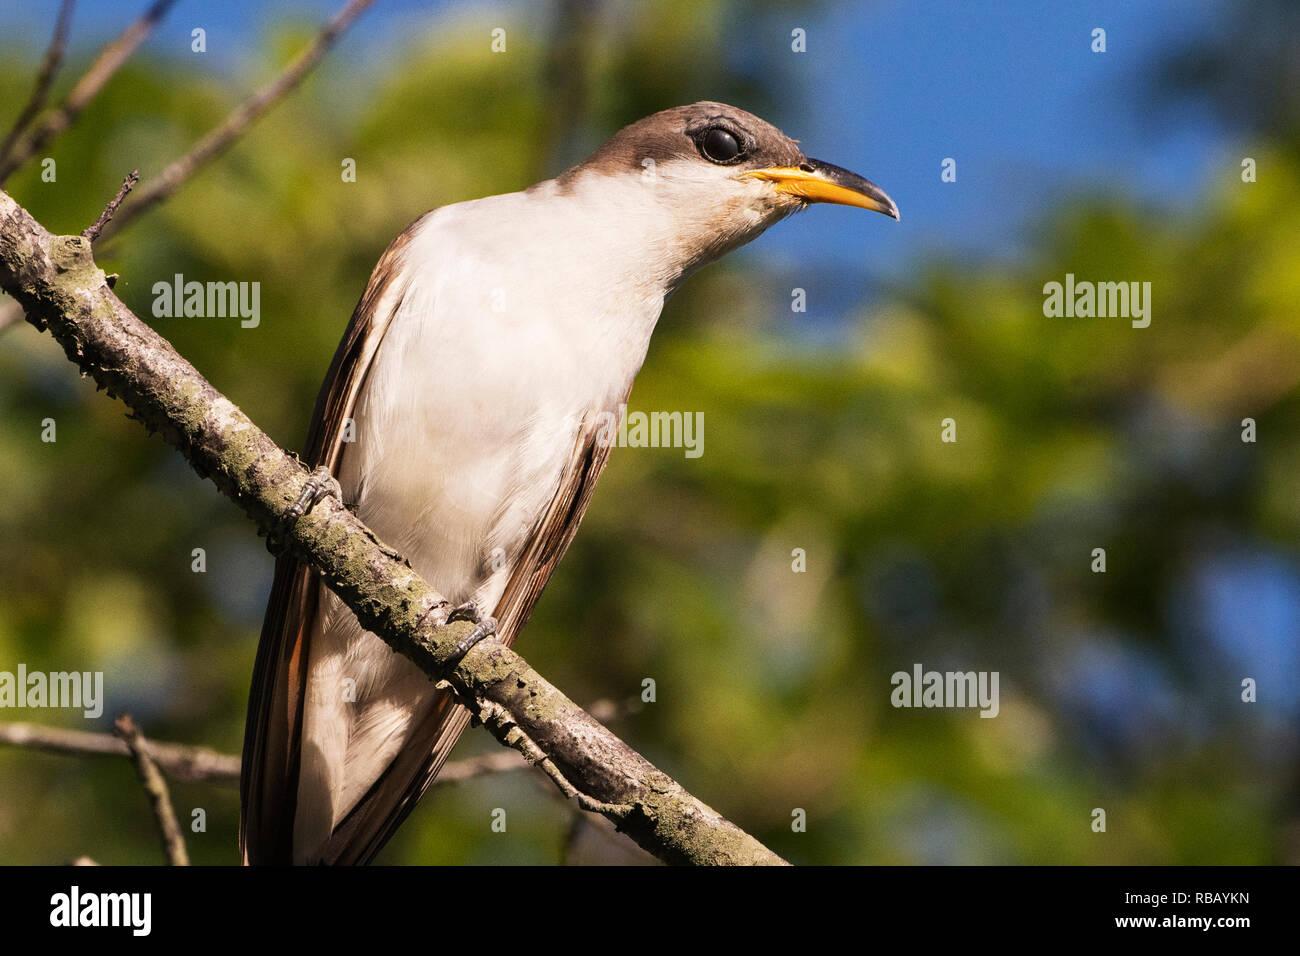 Yellow billed cuckoo up close - Stock Image